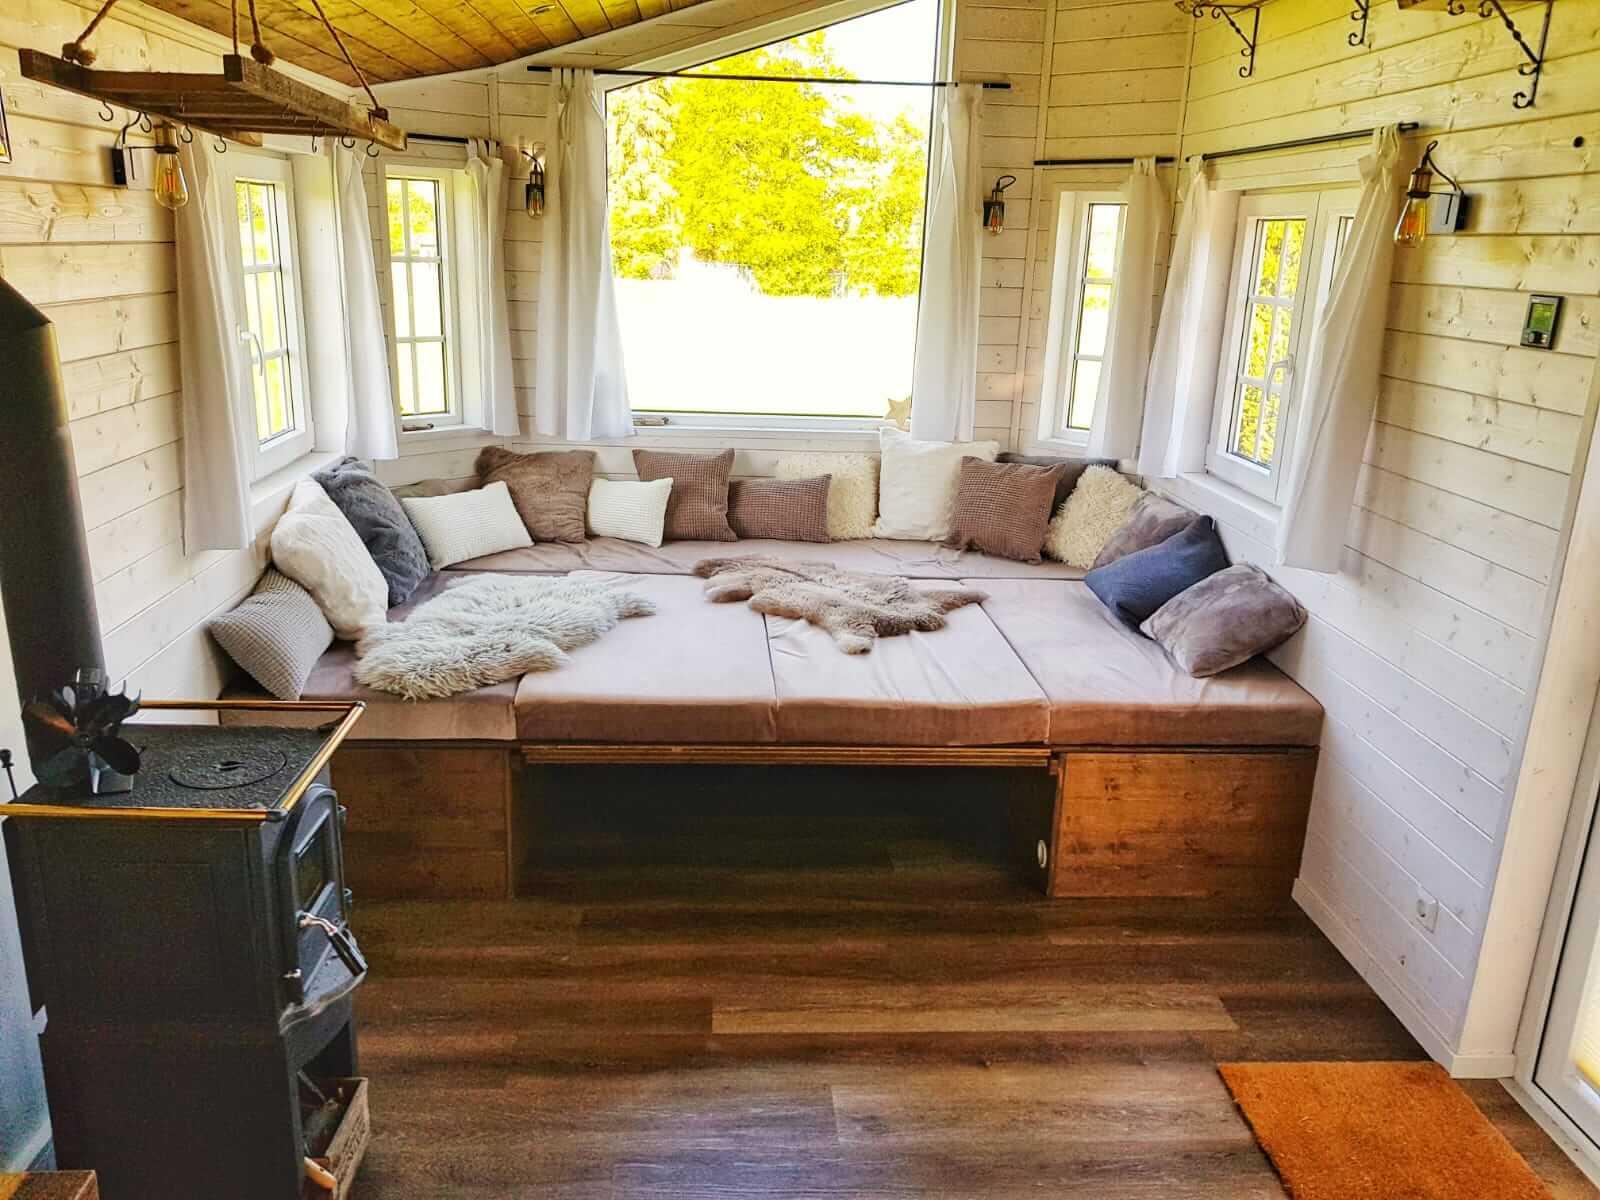 mobiles-tiny-house-lappland-vital-camp-gmbh-07